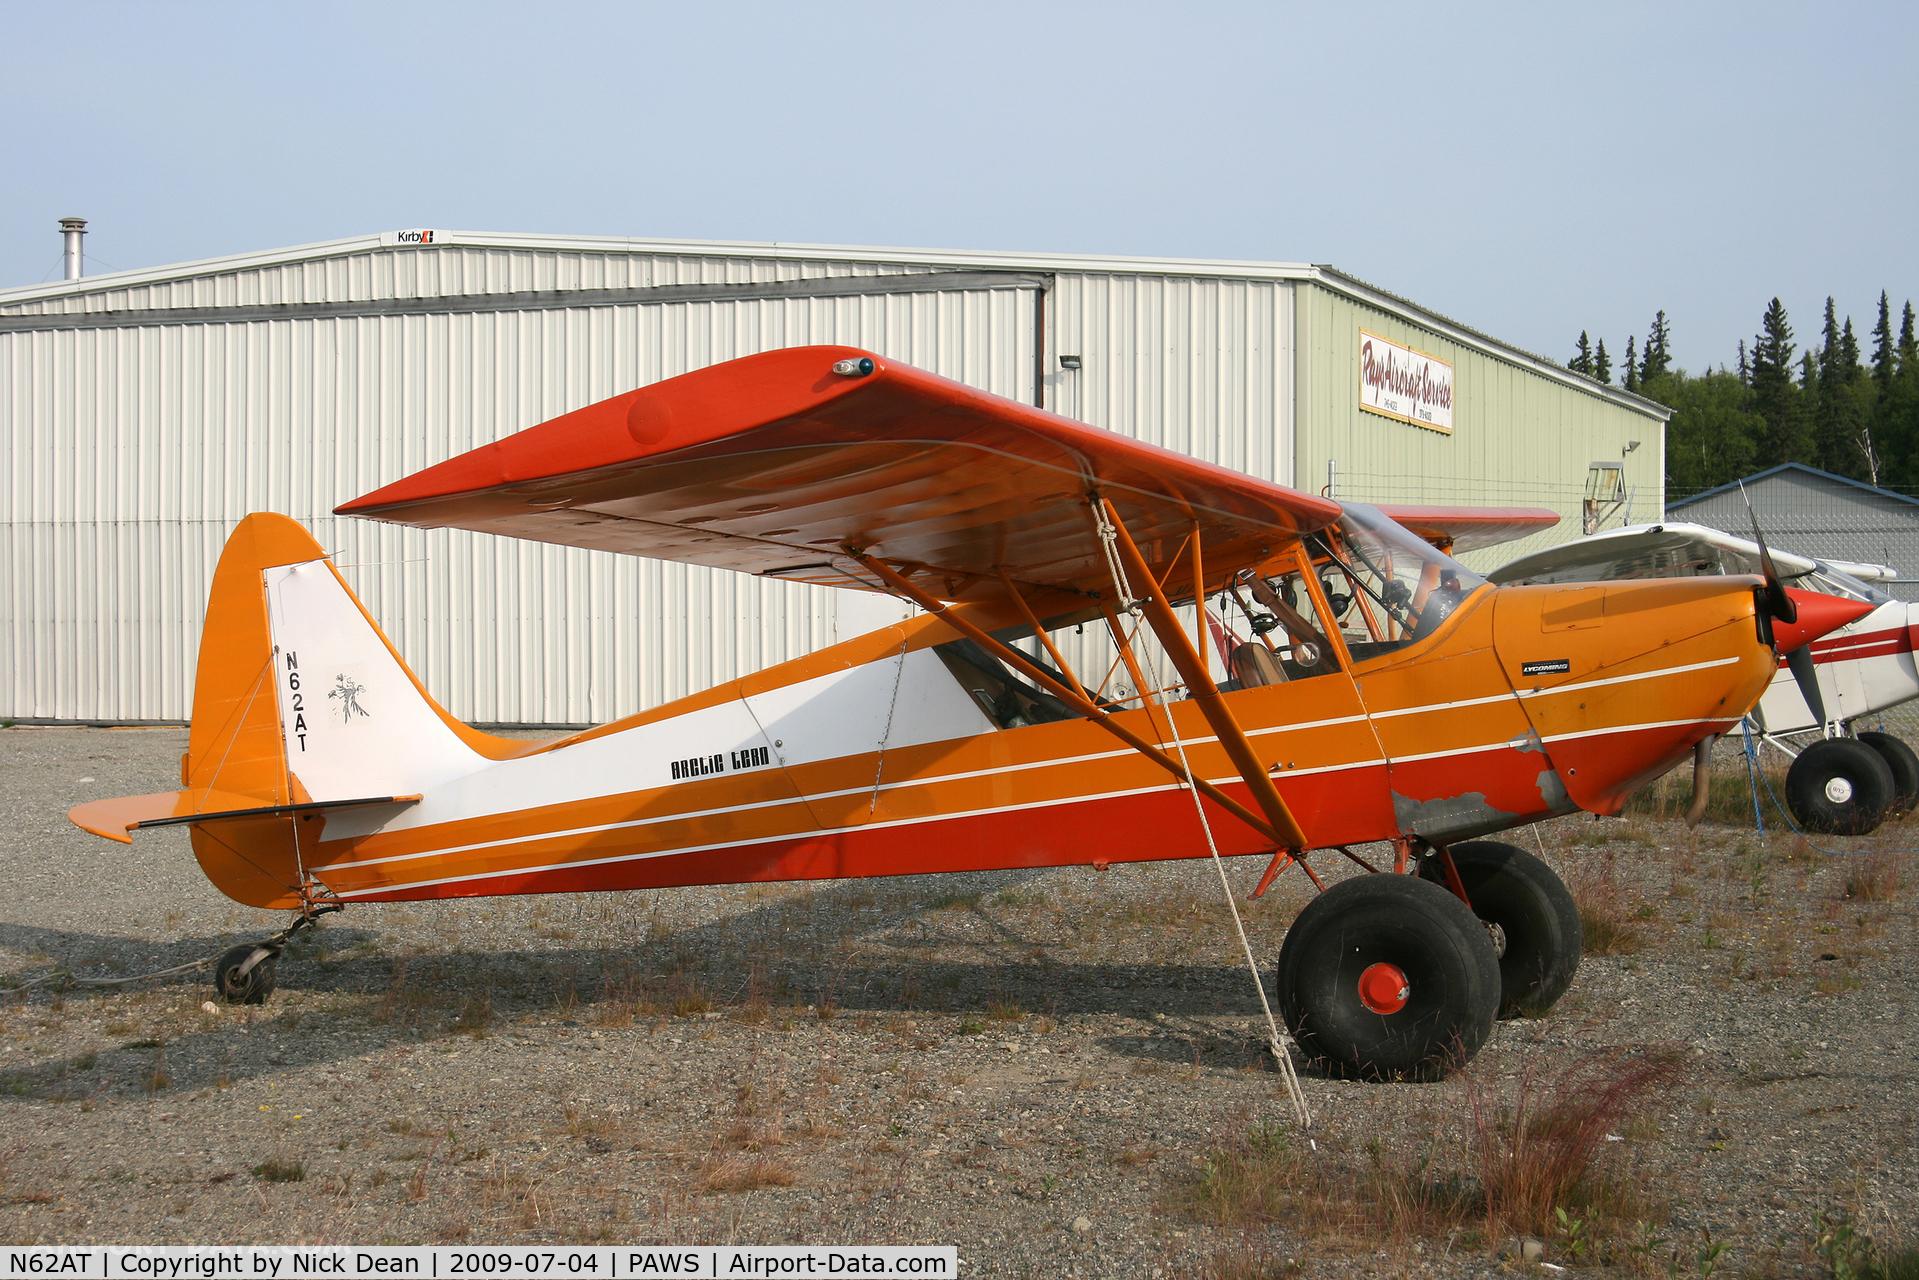 N62AT, 1980 Arctic Aircraft Co Inc S-1B2 C/N 1013, PAWS